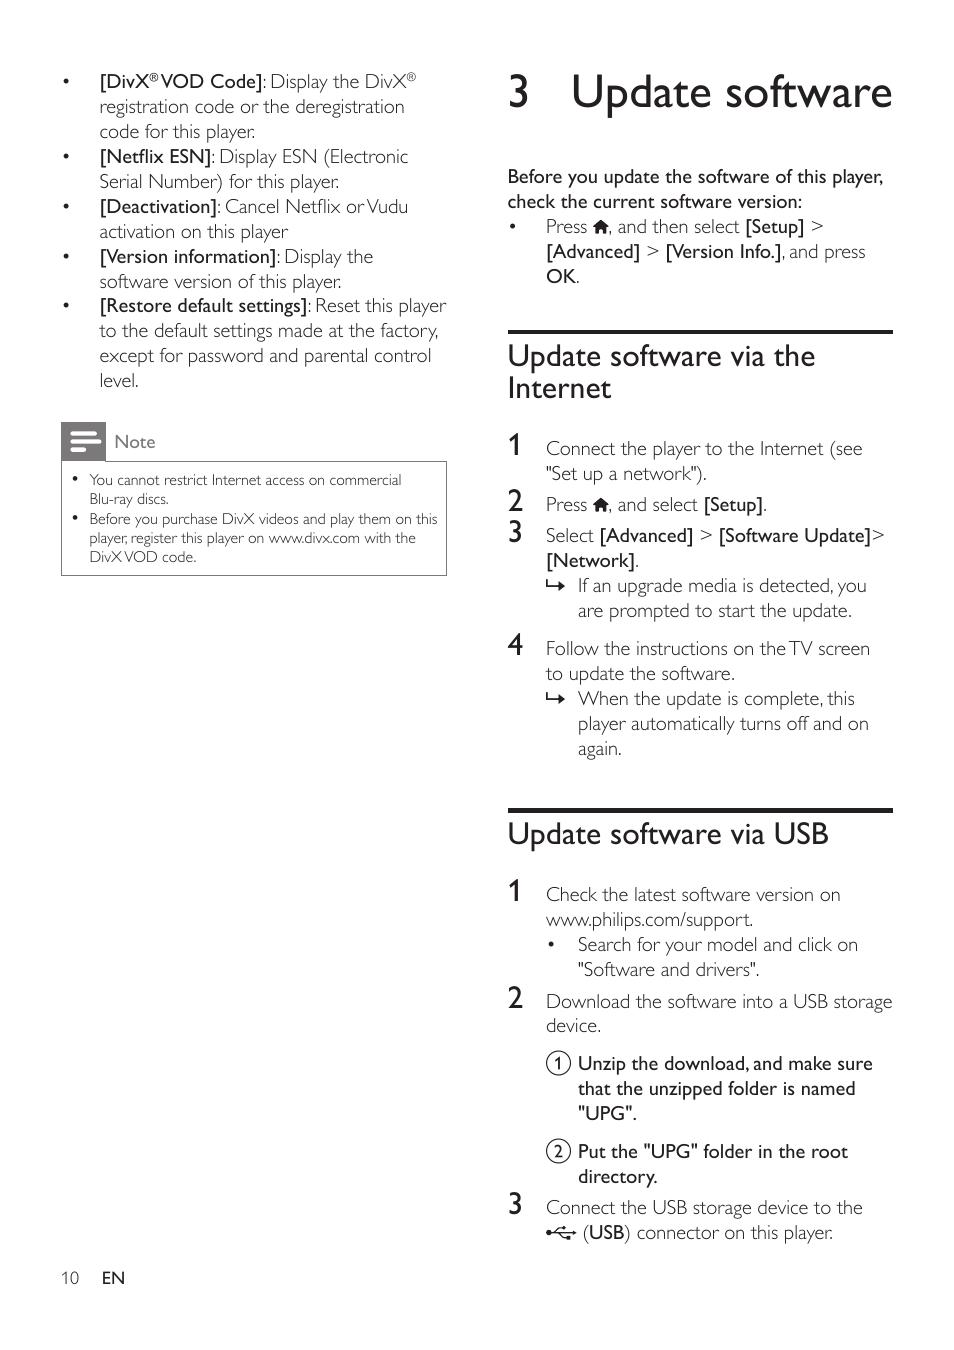 3 update software, Update software via the internet, Update software